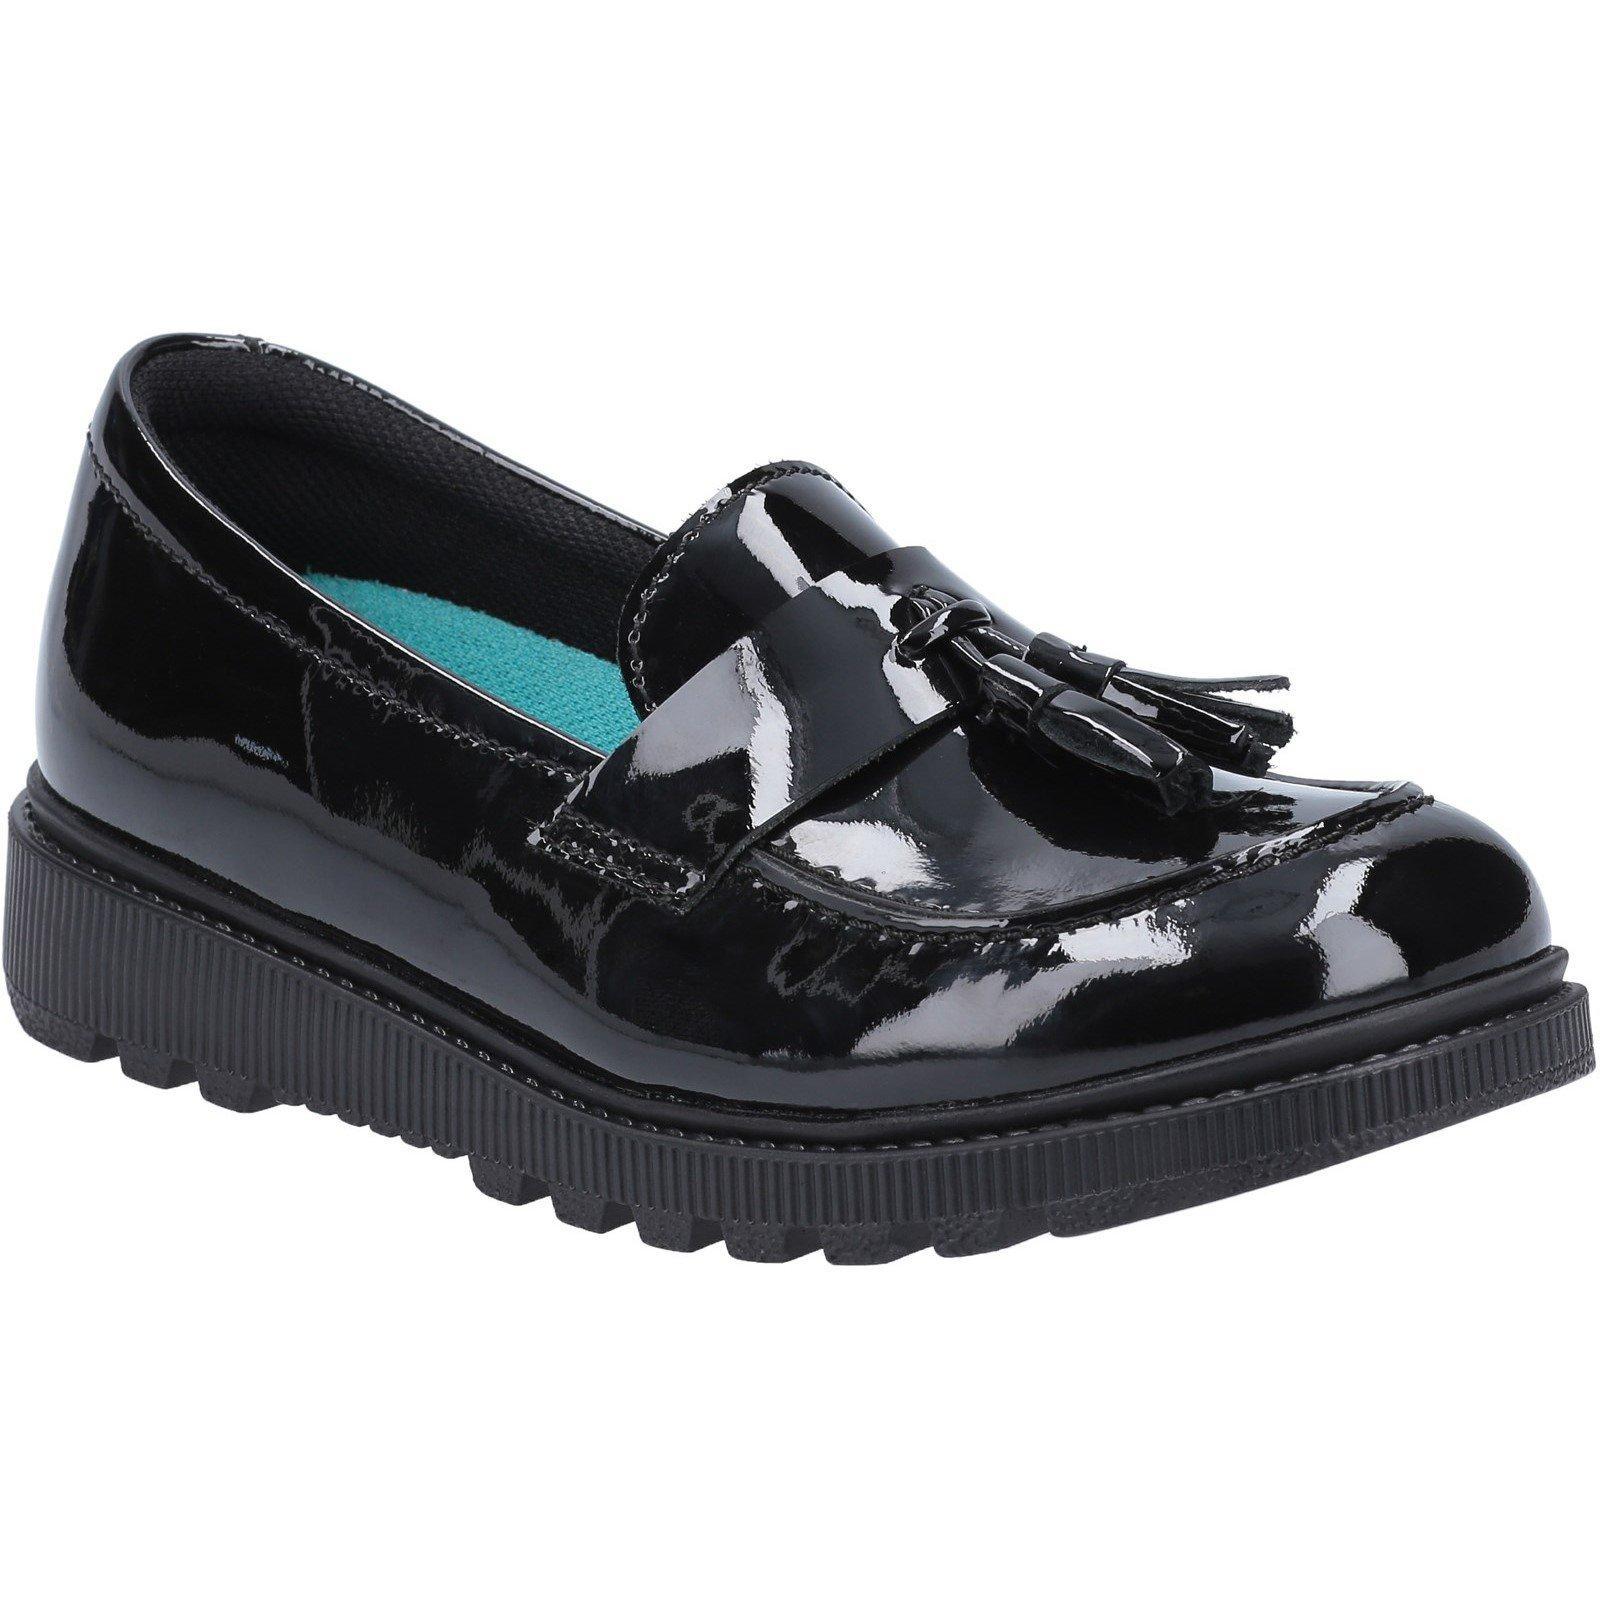 Hush Puppies Kid's Karen Senior School Shoe Patent Black 30828 - Patent Black 7